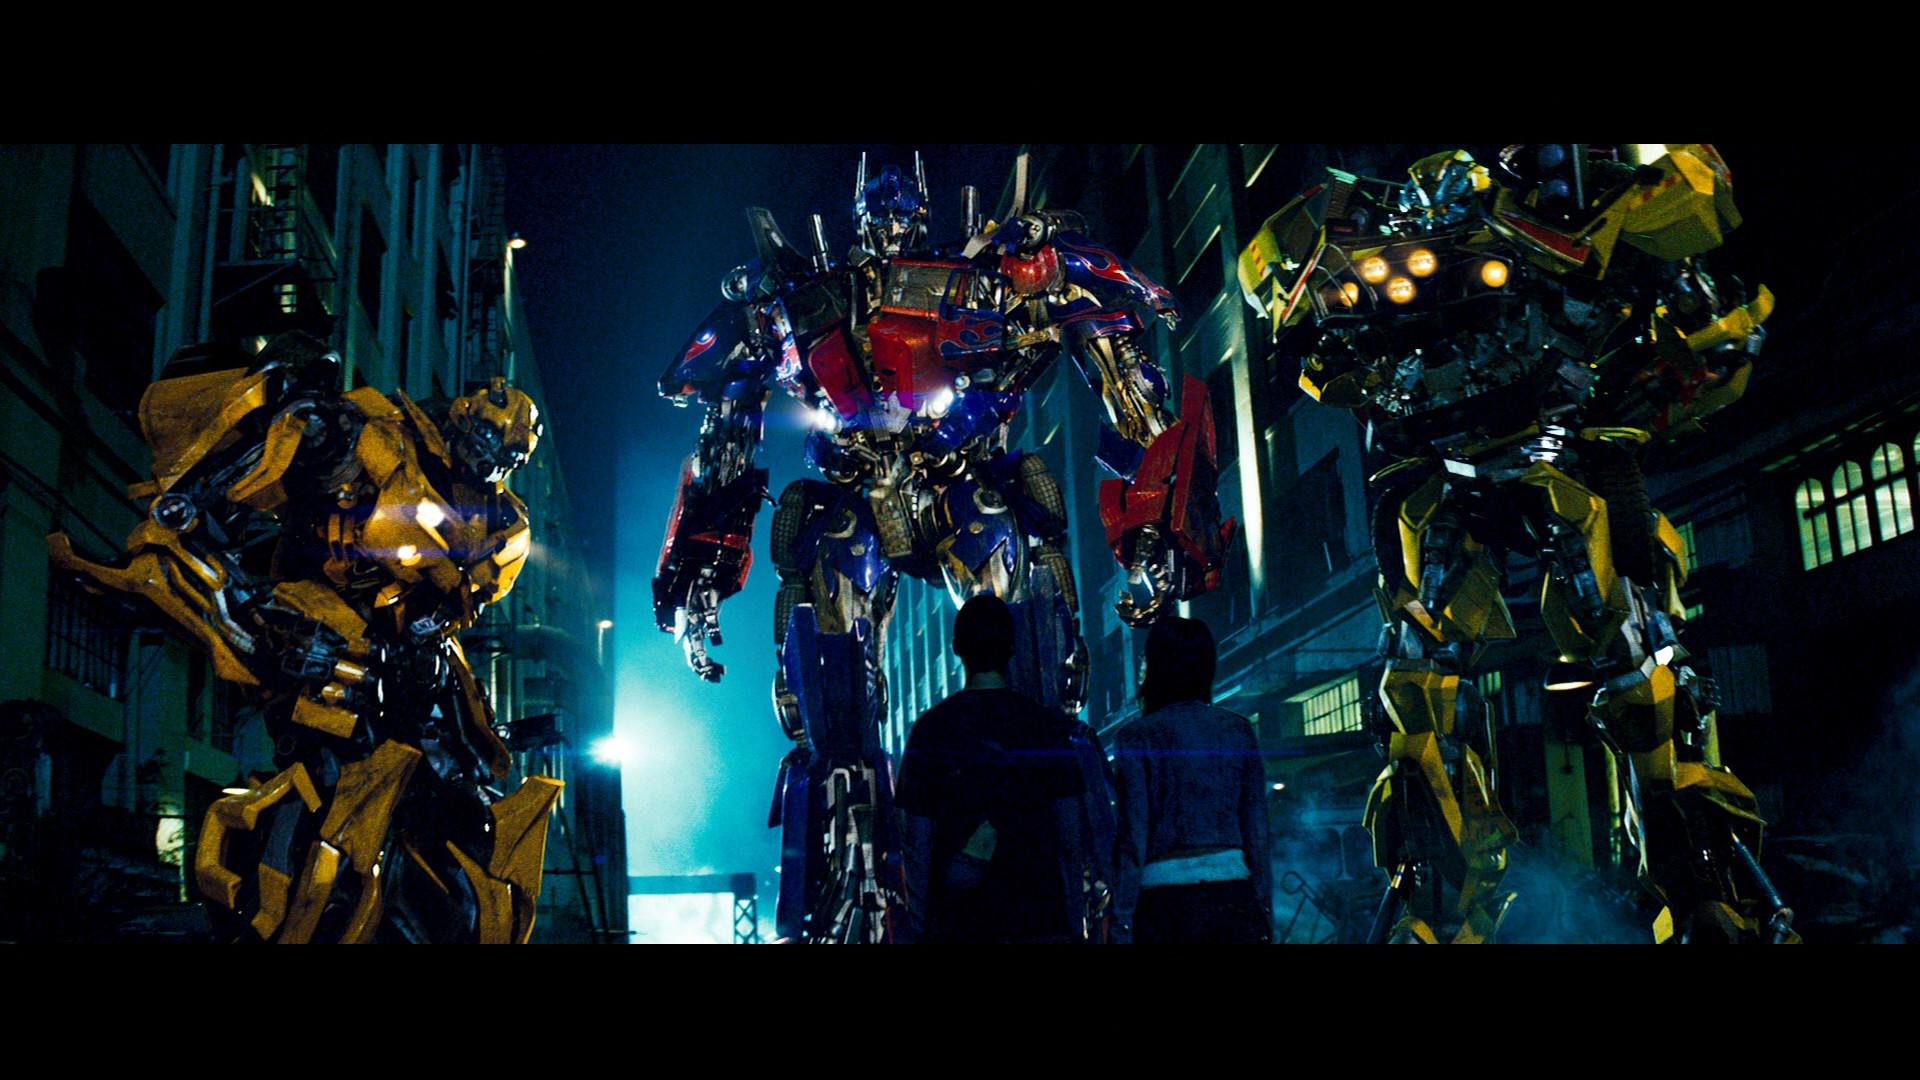 Wallpaper Transformers Bumblebee 68 Images